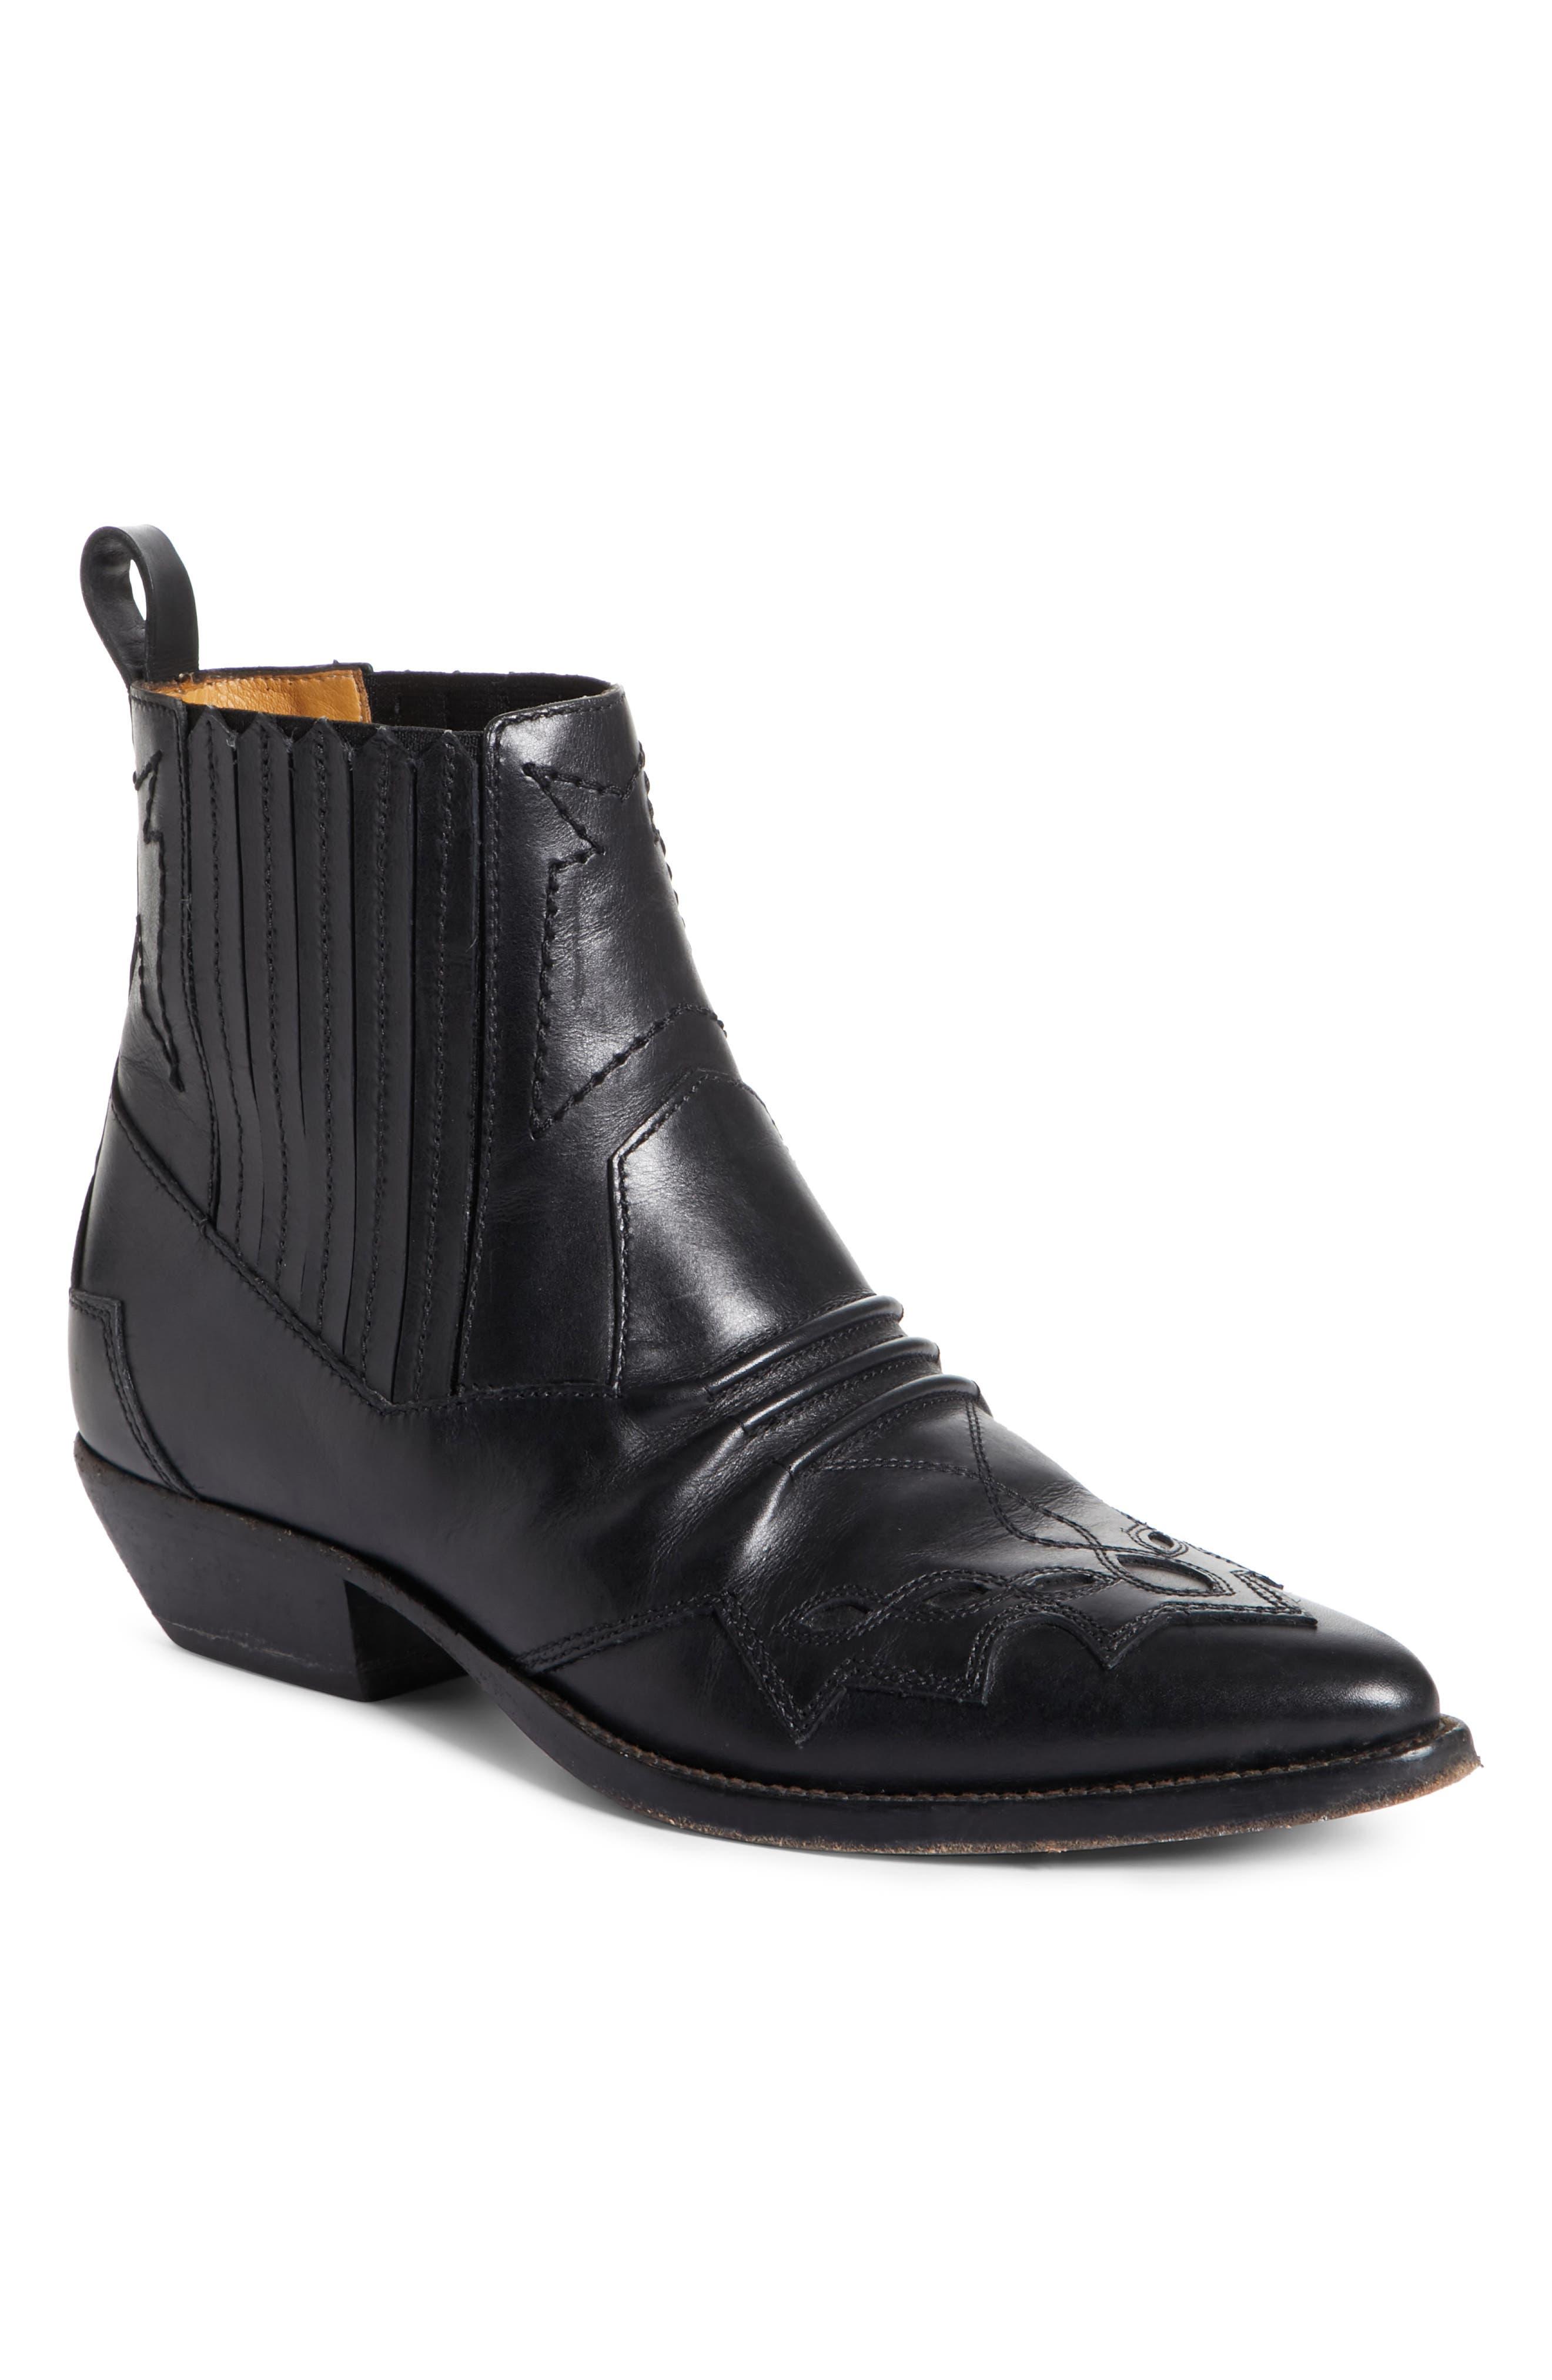 ROSEANNA Tucson Boot in Noir